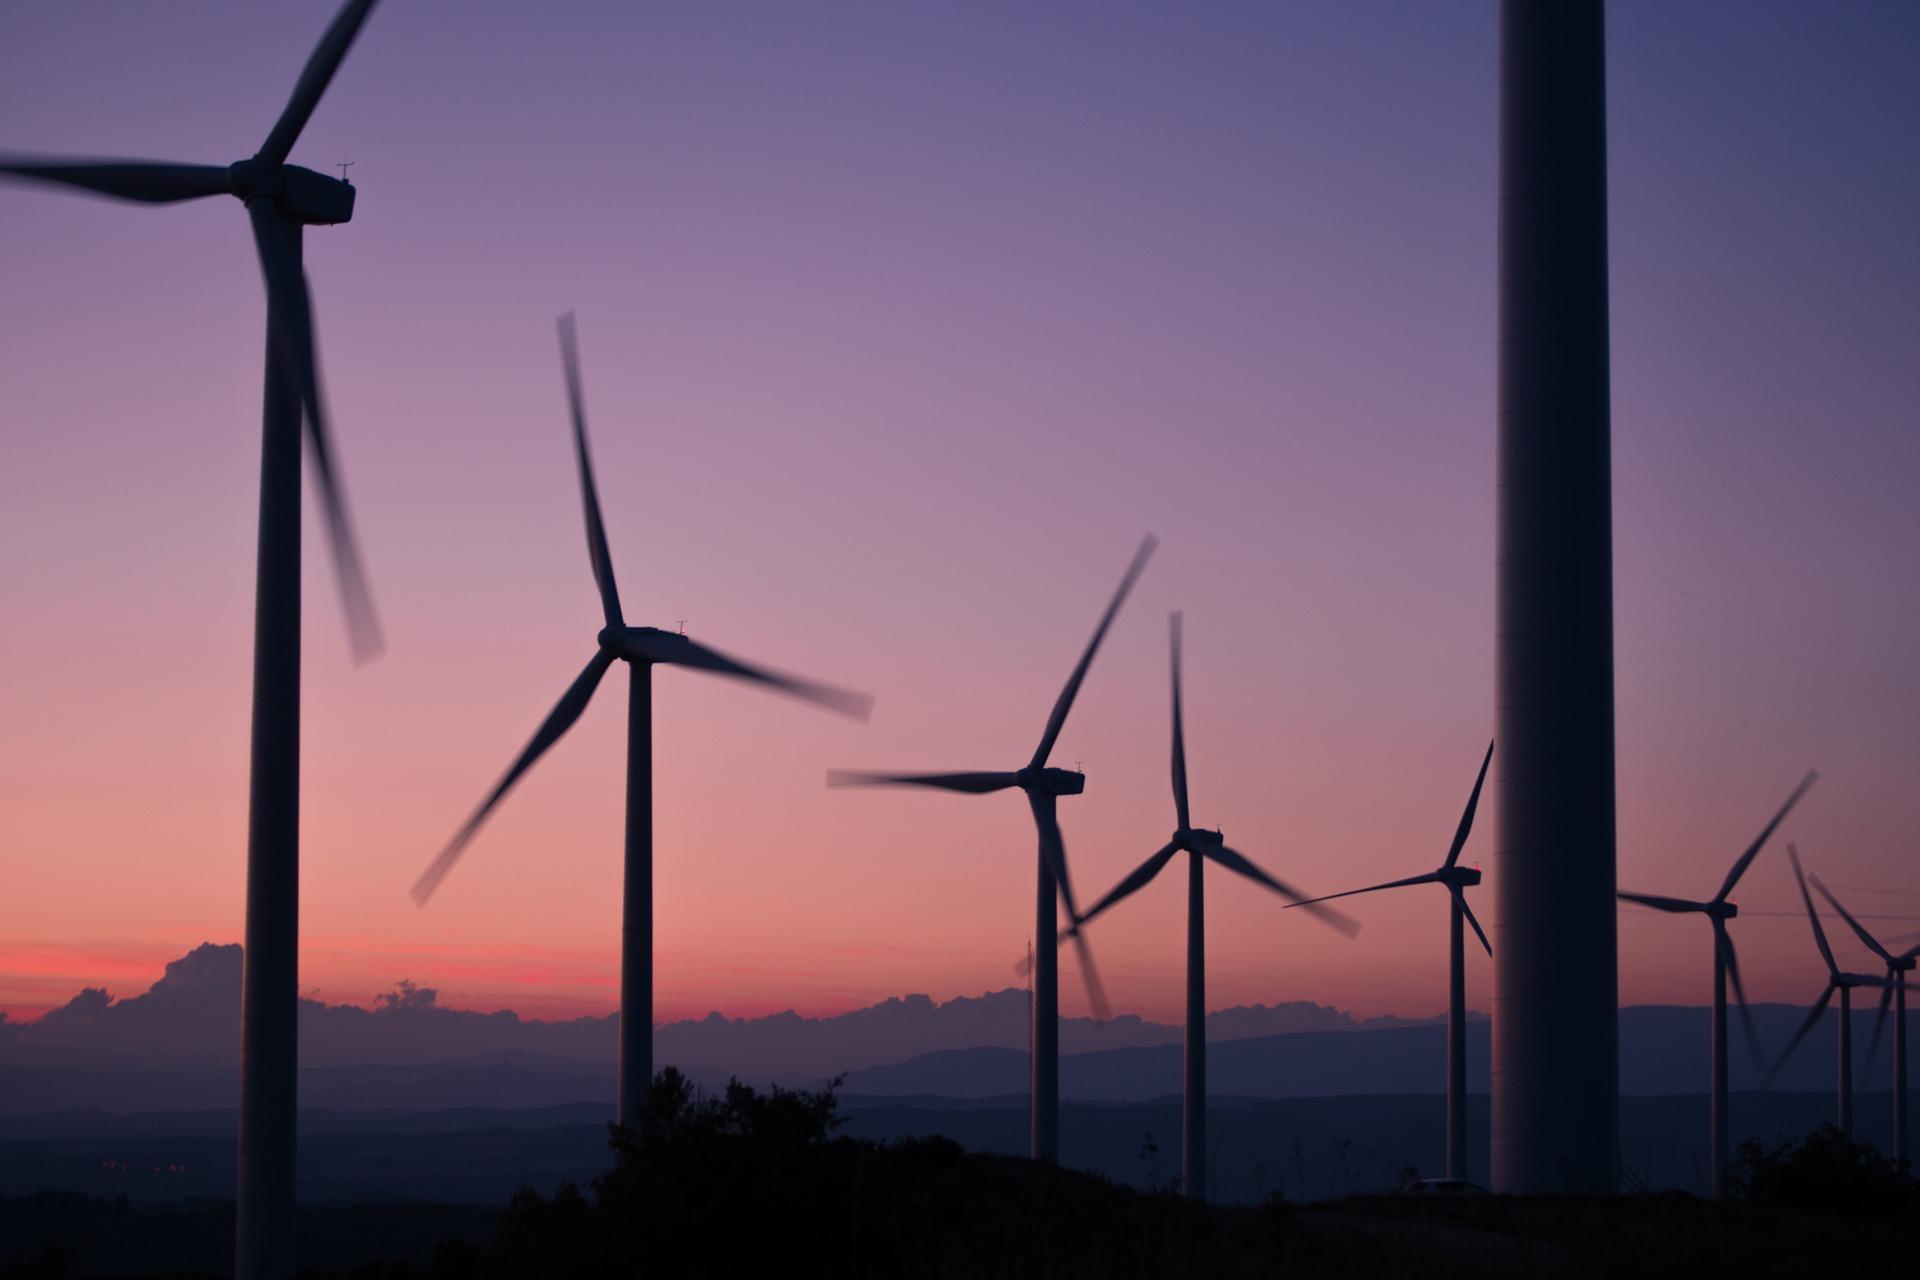 Windkraft-Stromerzeuger